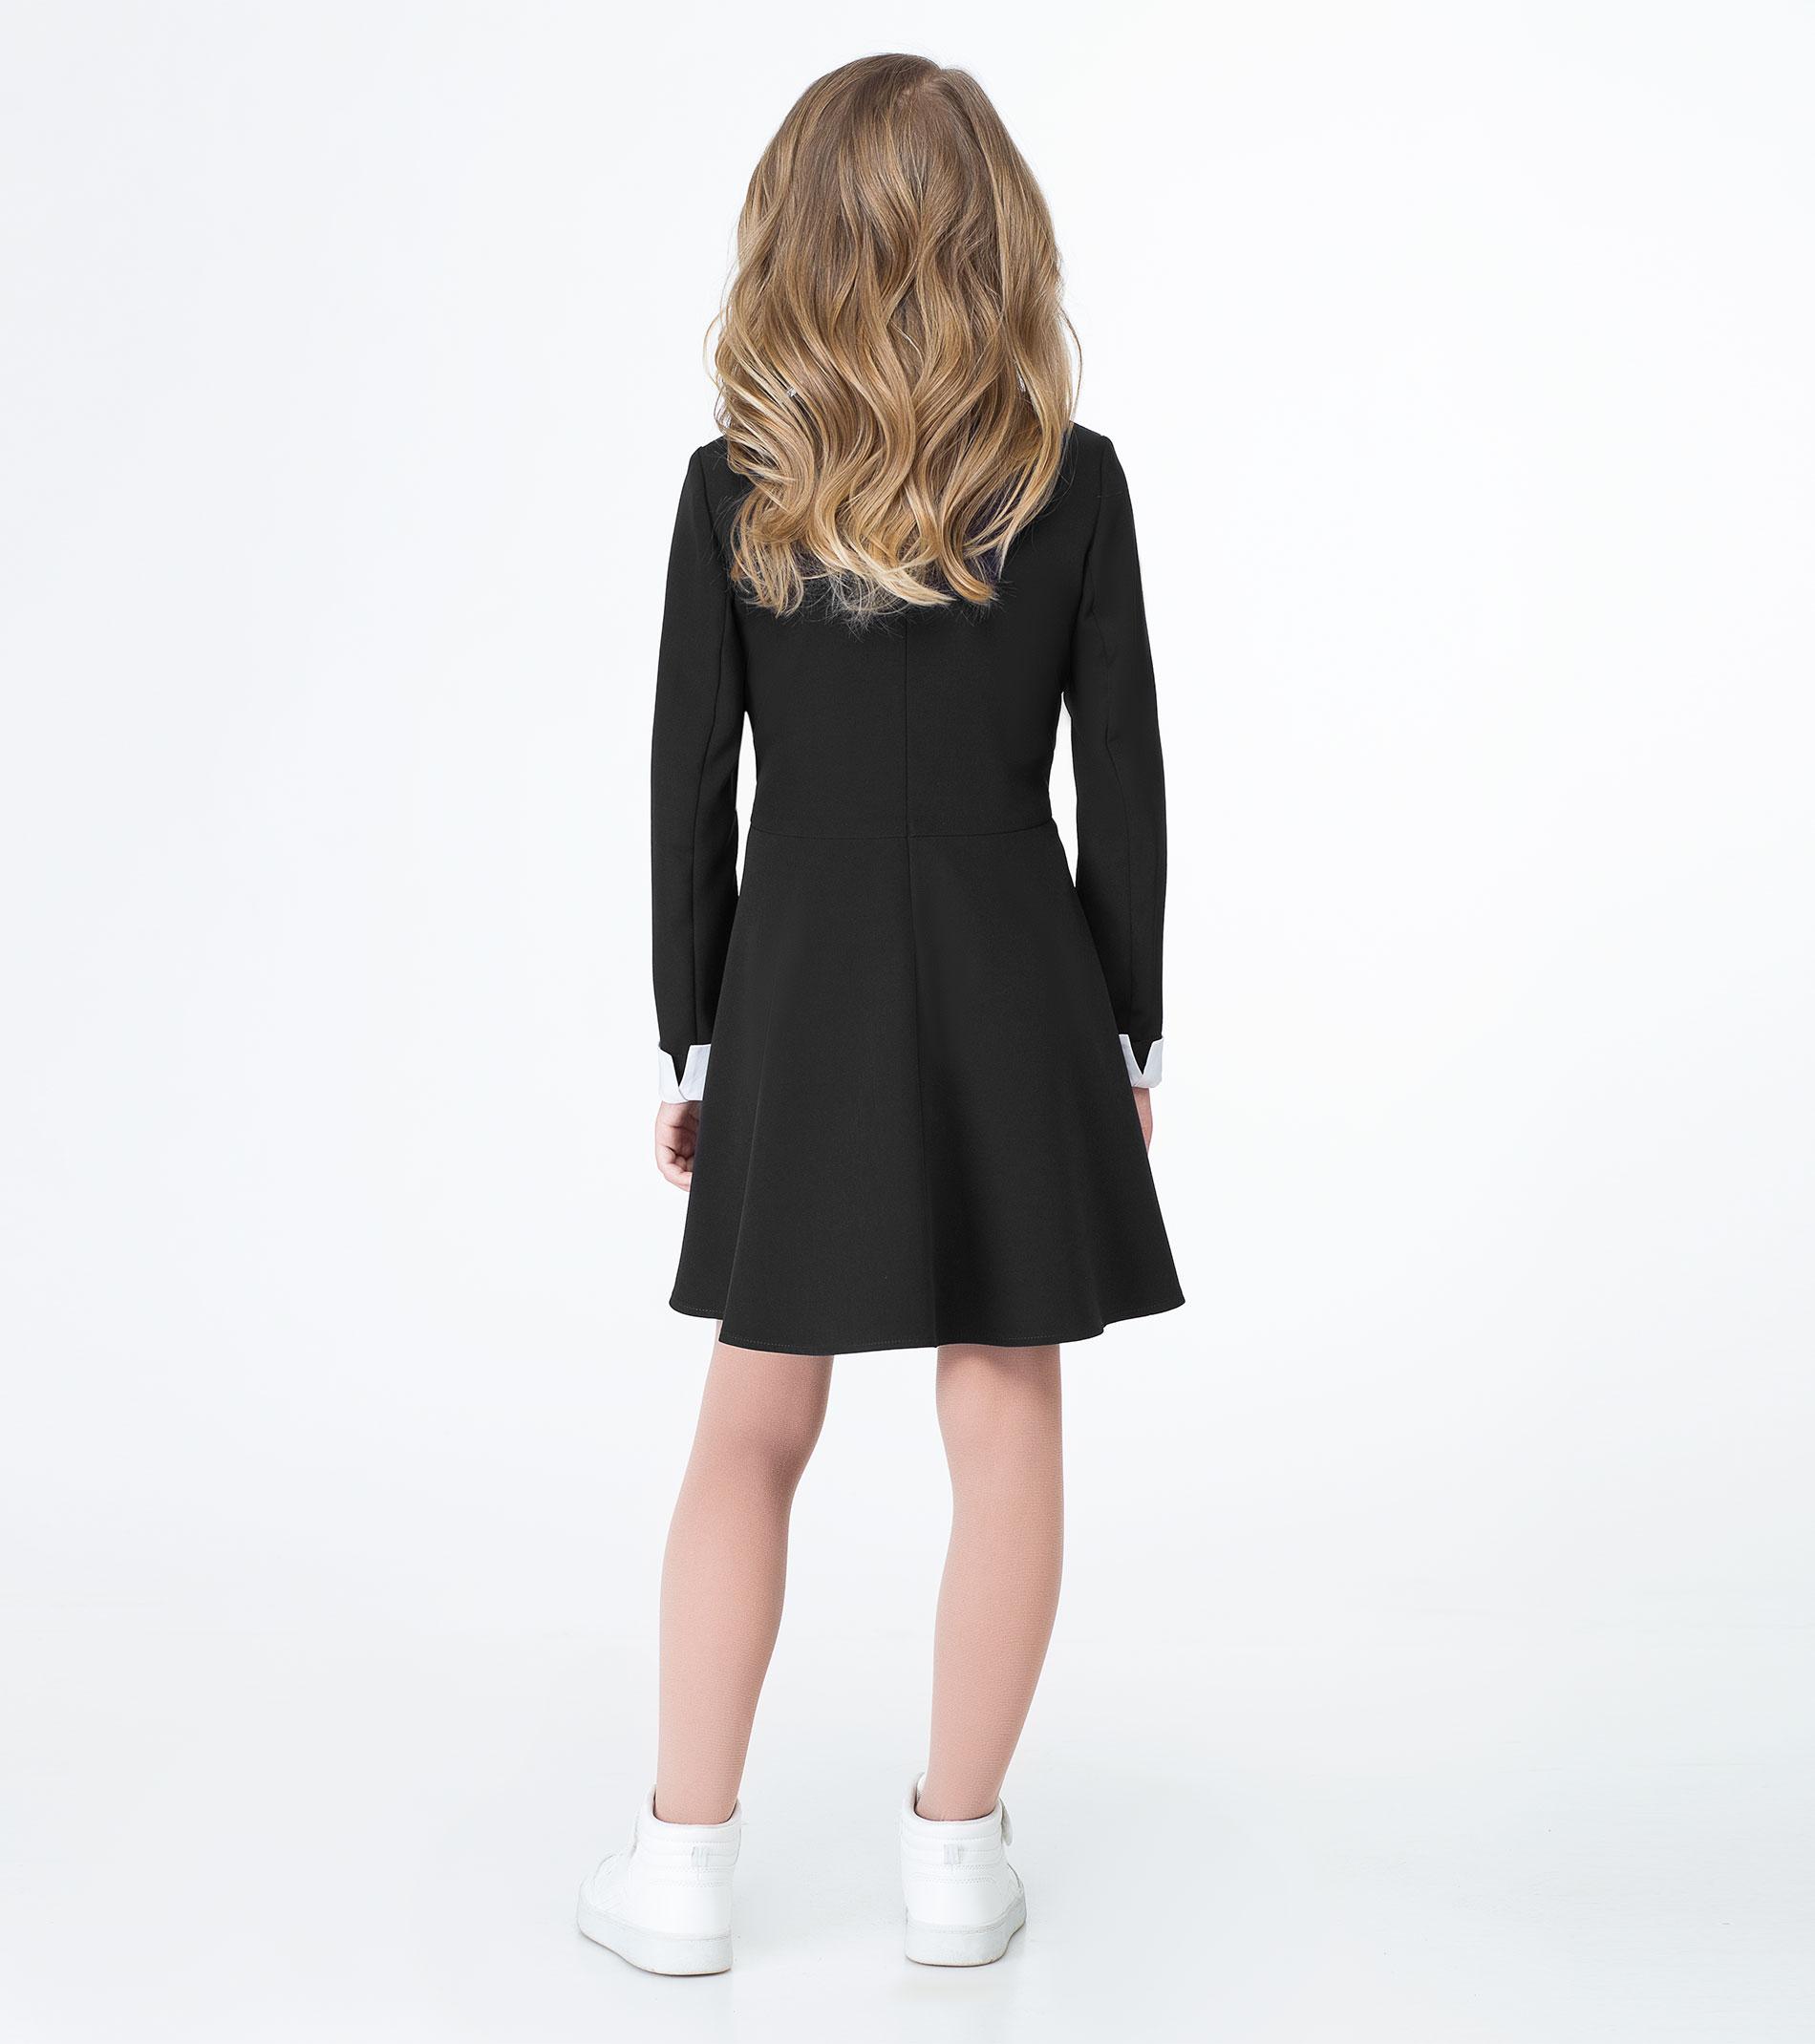 916f0e79b7a9 Платье для девочки 236080 оптом от производителя Panda Kids